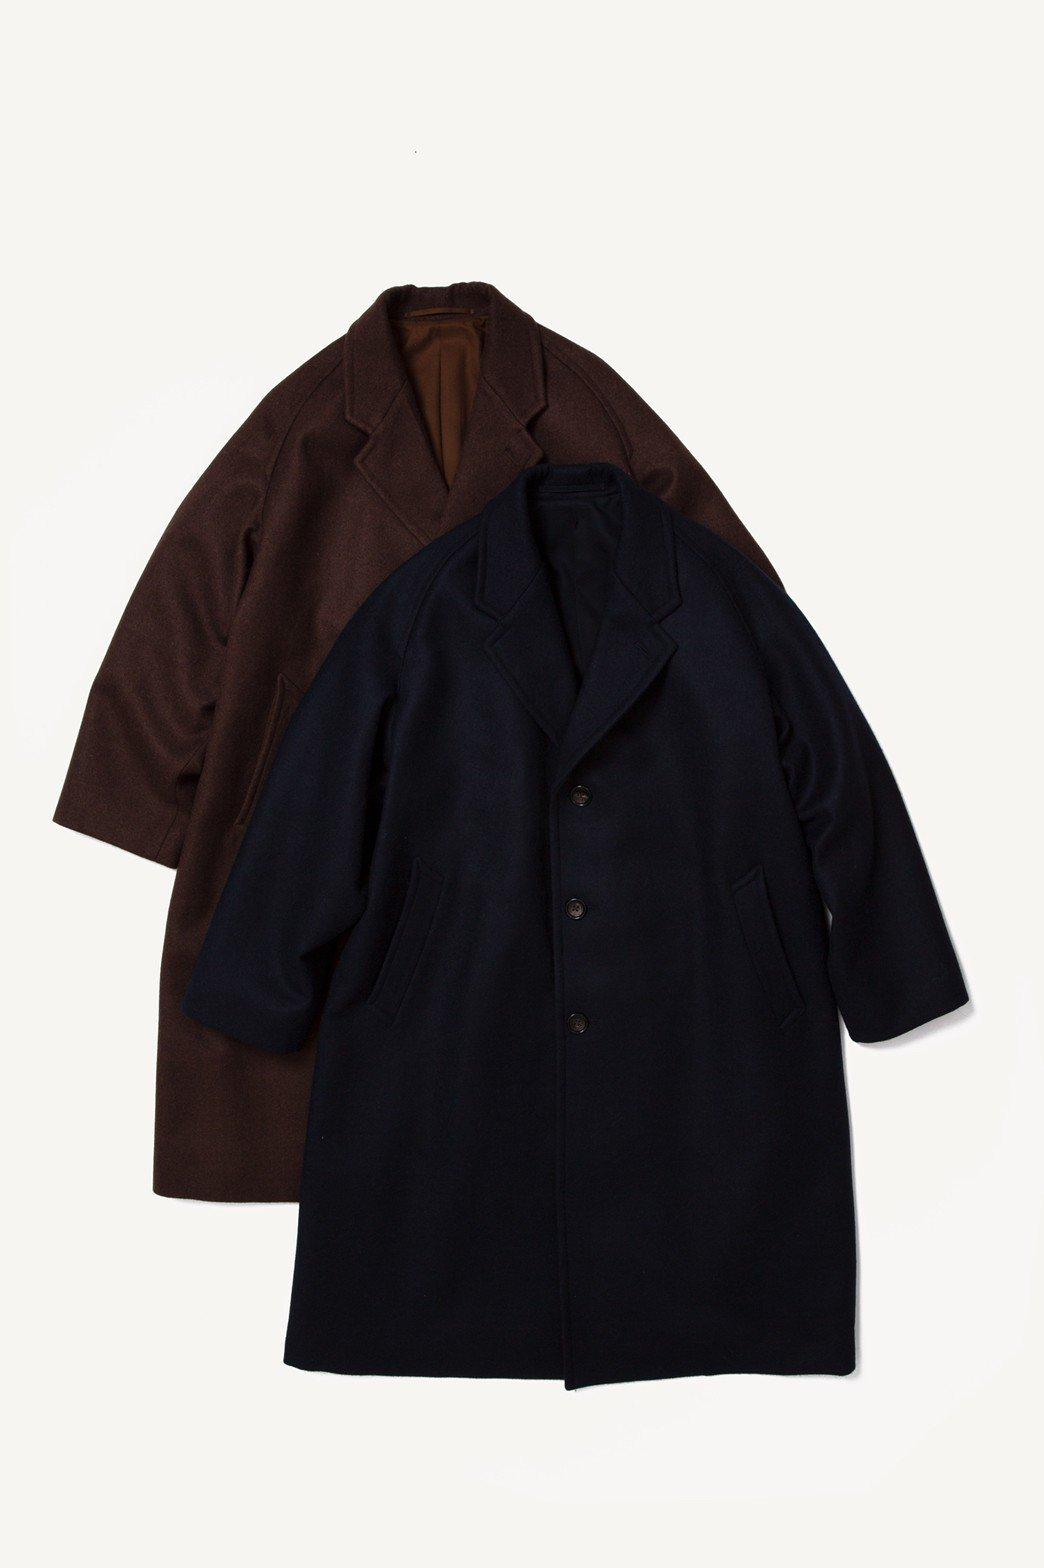 A.PRESSE / Chester Coat